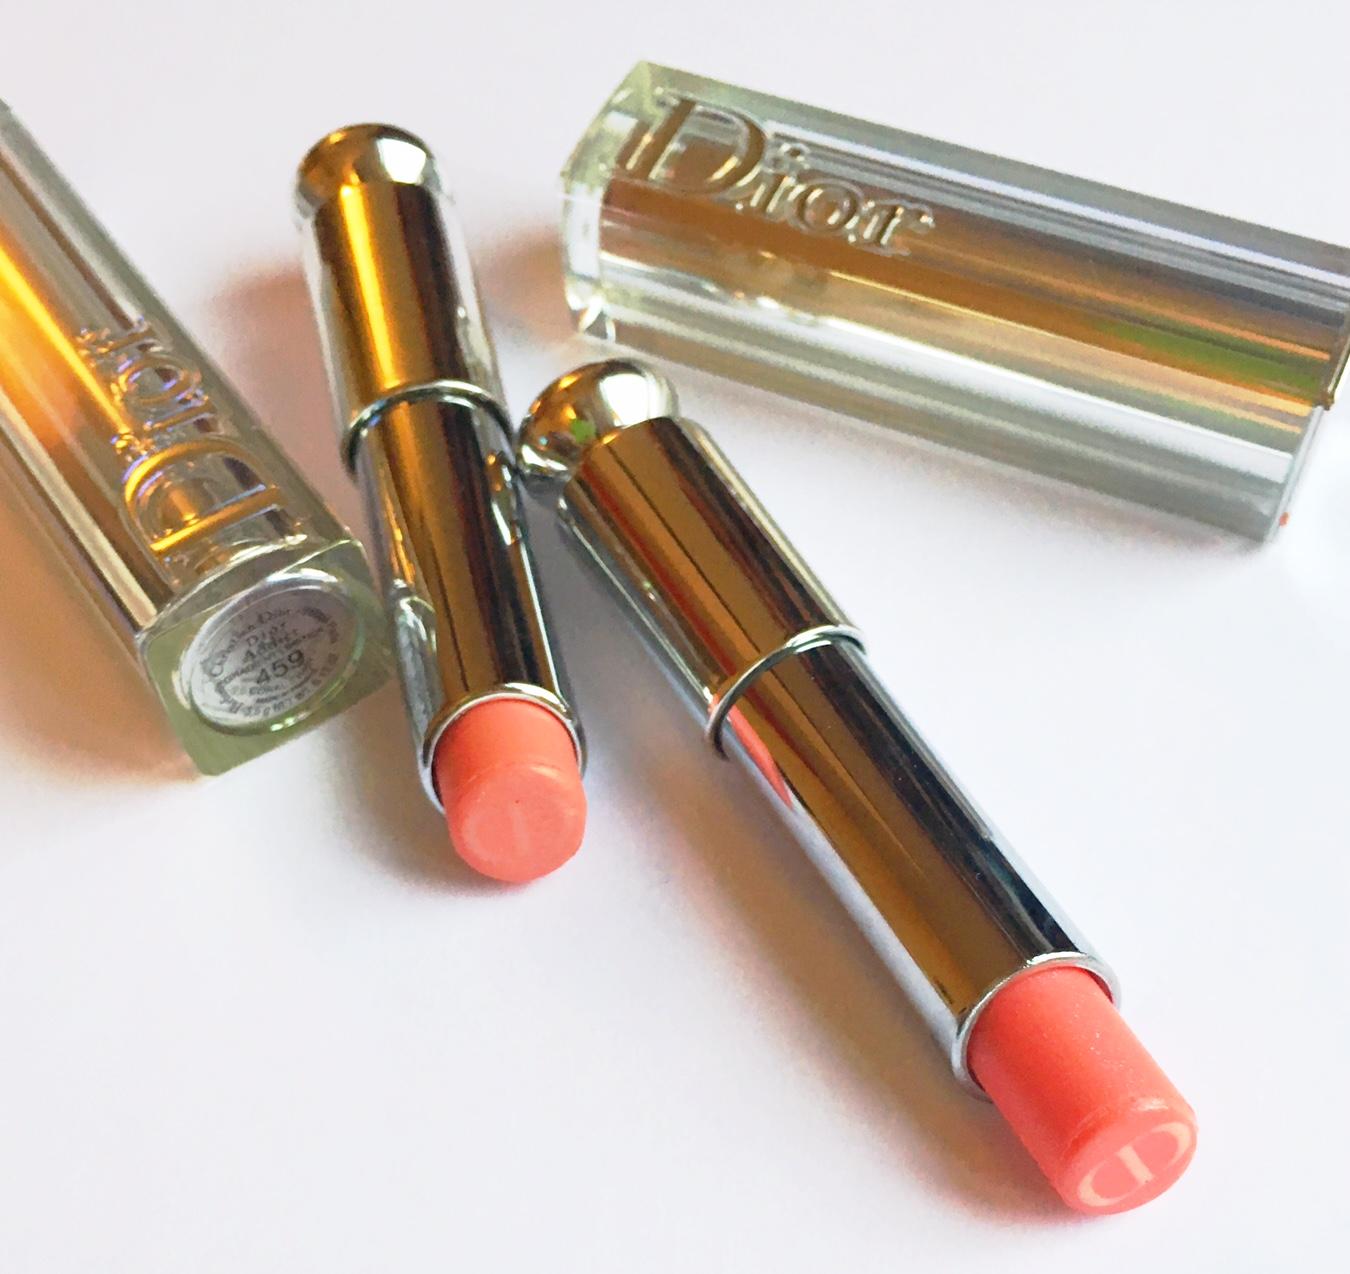 Dior's new Dior Addict Gradient Lipsticks